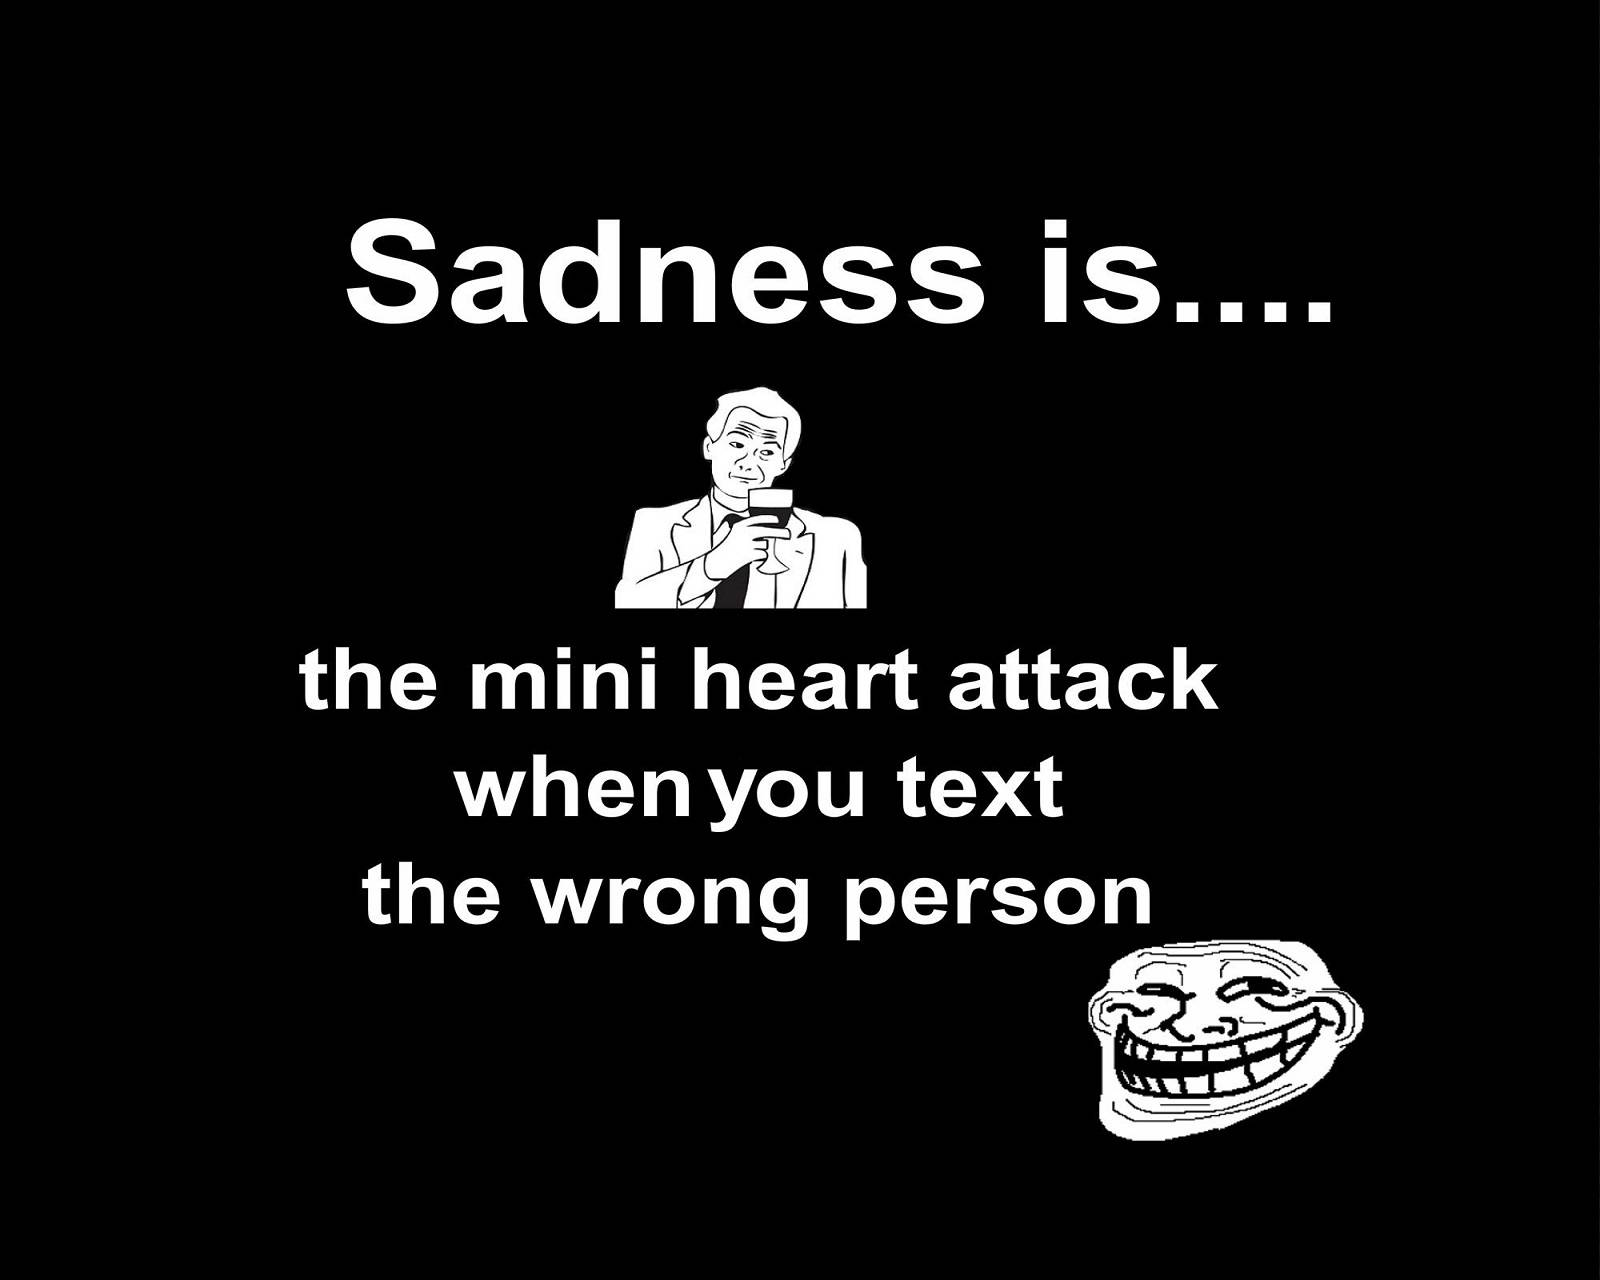 Sadness is